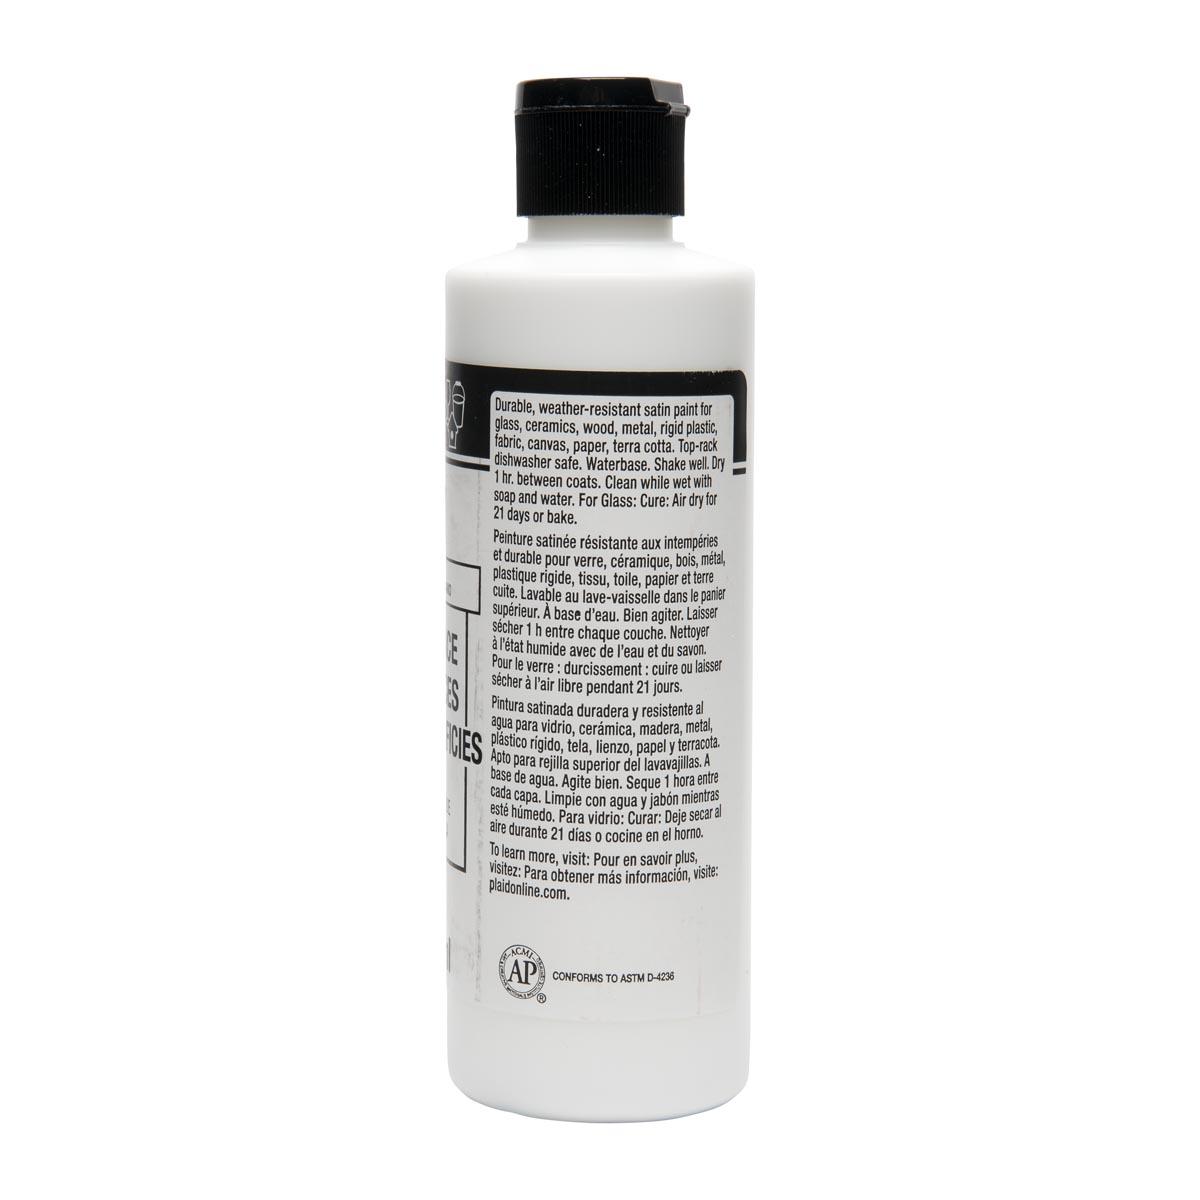 FolkArt ® Multi-Surface Satin Acrylic Paints - Titanium White, 8 oz.